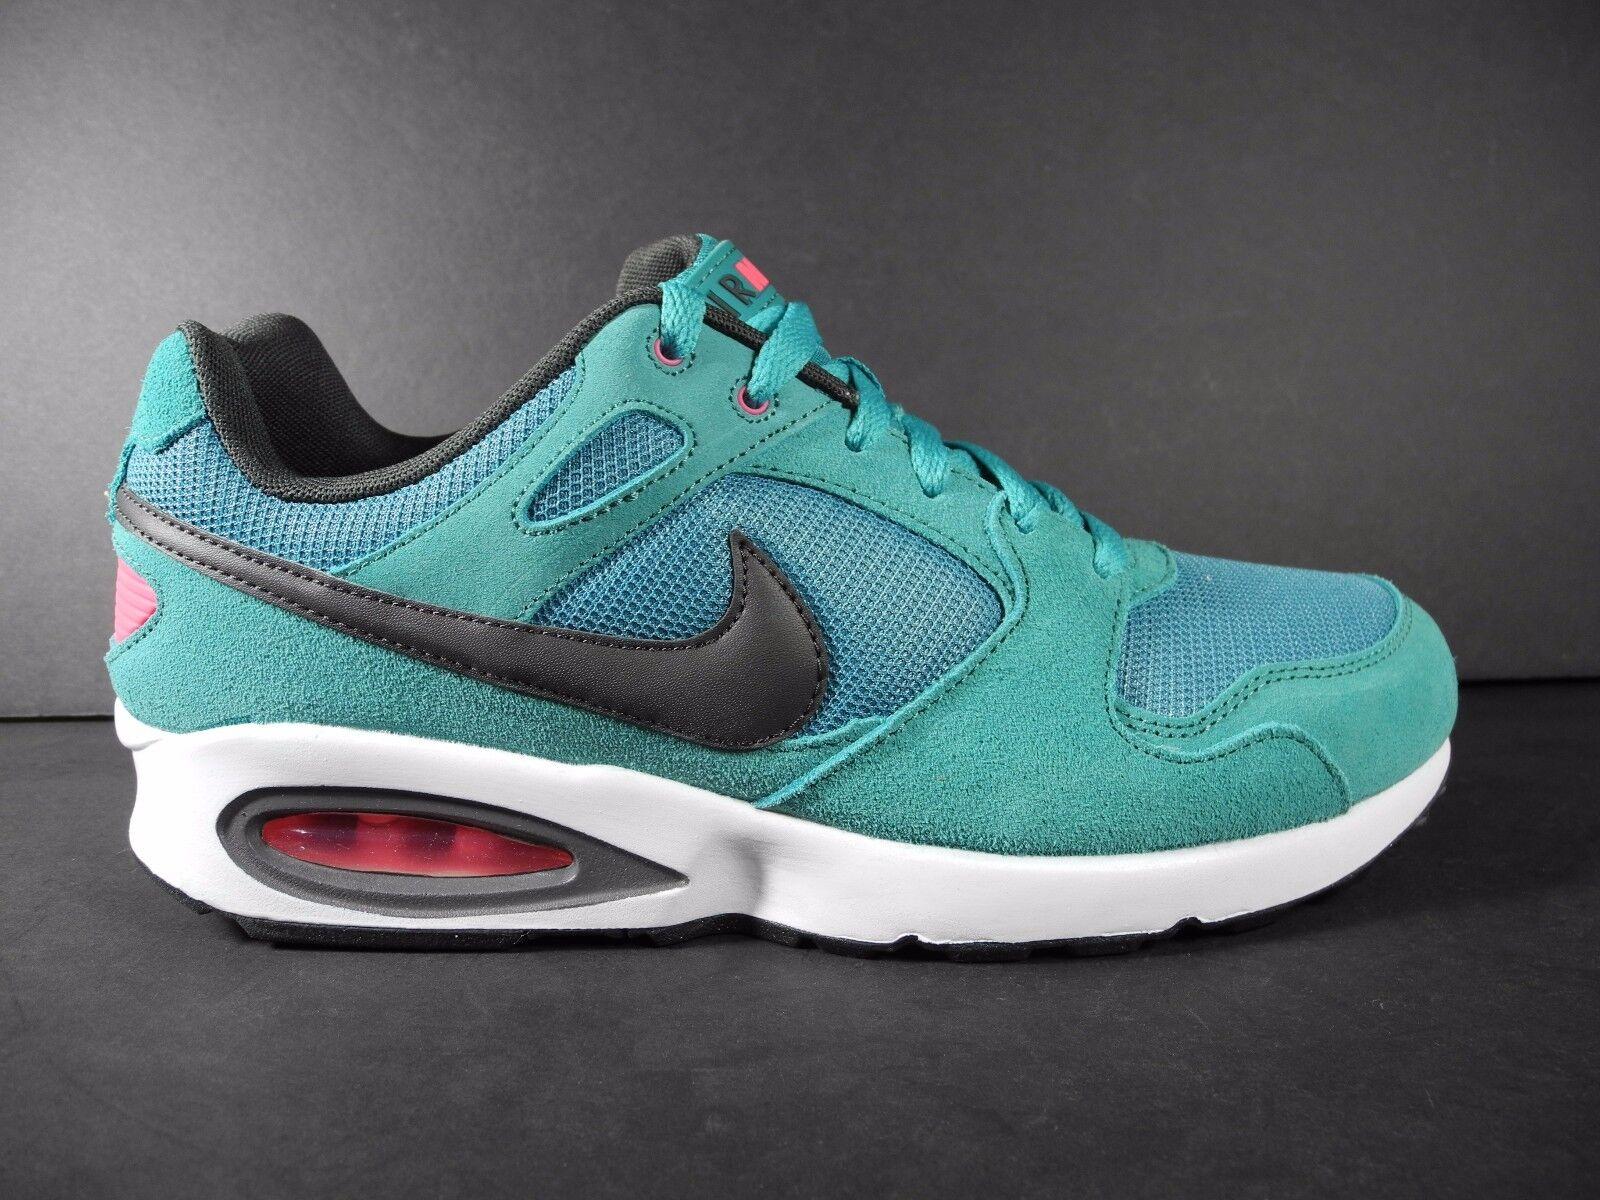 NEW NIKE AIR MAX COLISEUM COLISEUM MAX RACER Men's Running Training  Shoes Size US 9.5 59f06d